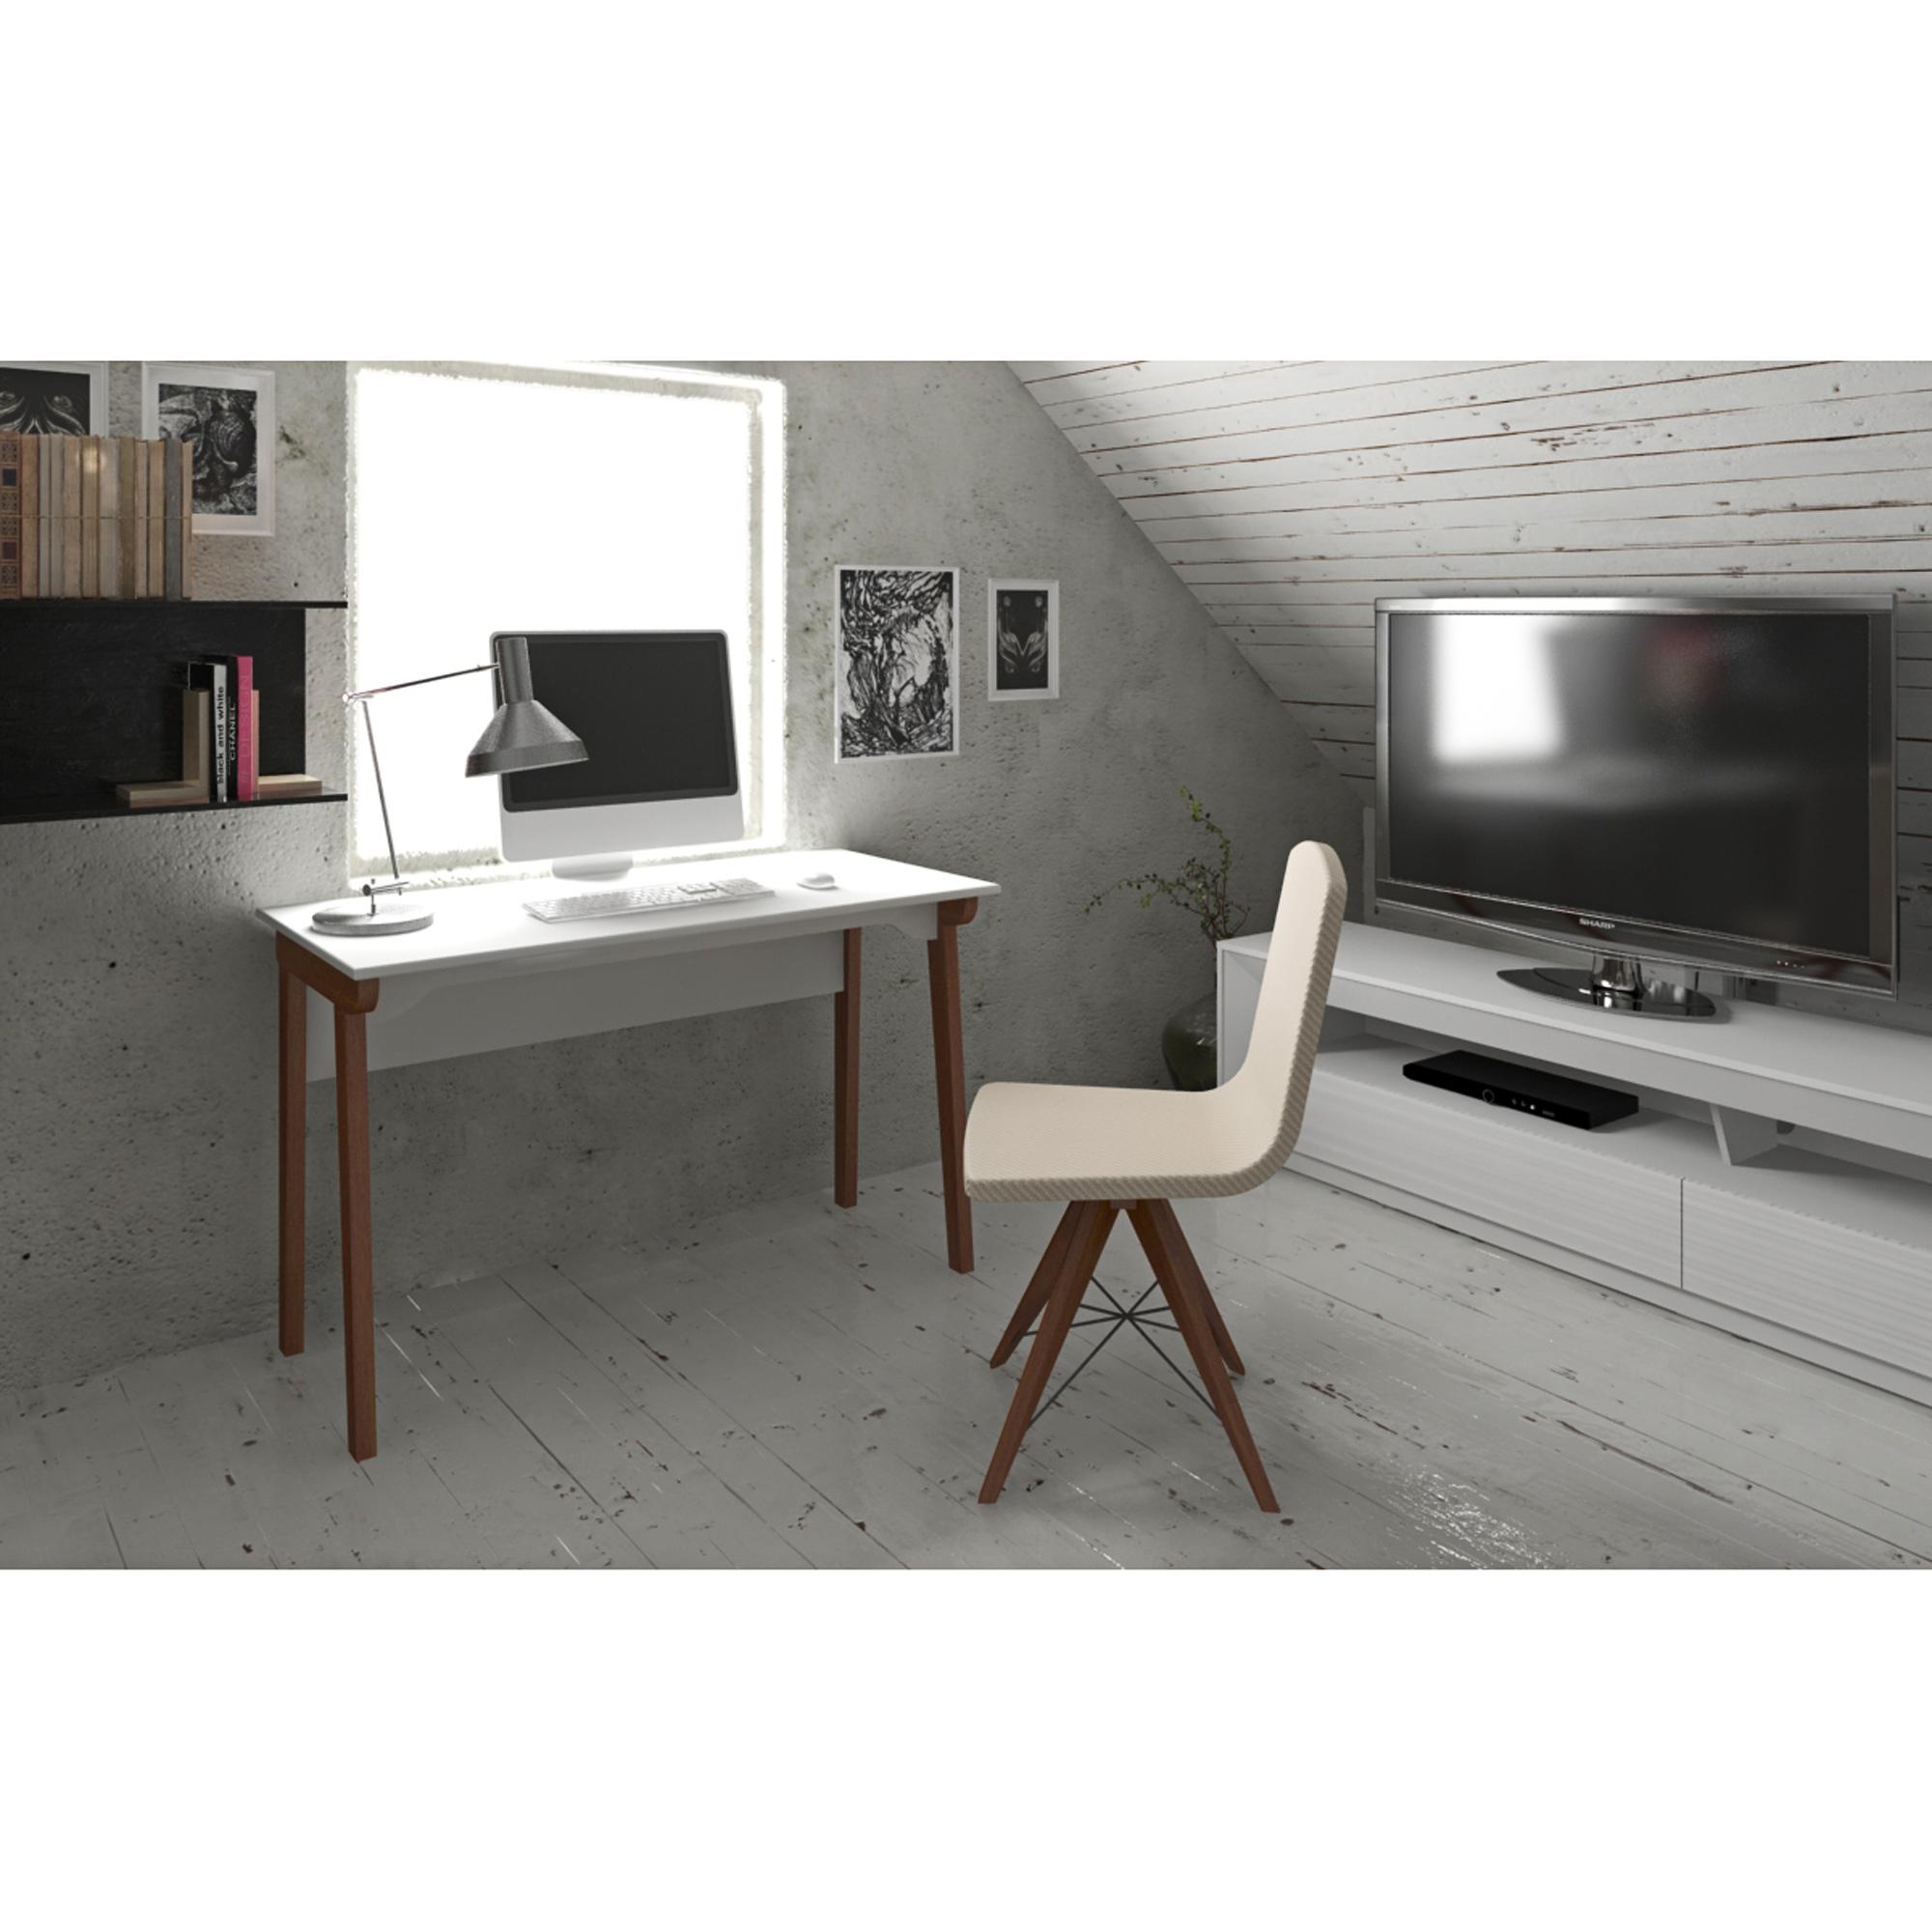 Llr 34500 Lorell Mid Century Modern Office Desk Lorell Furniture